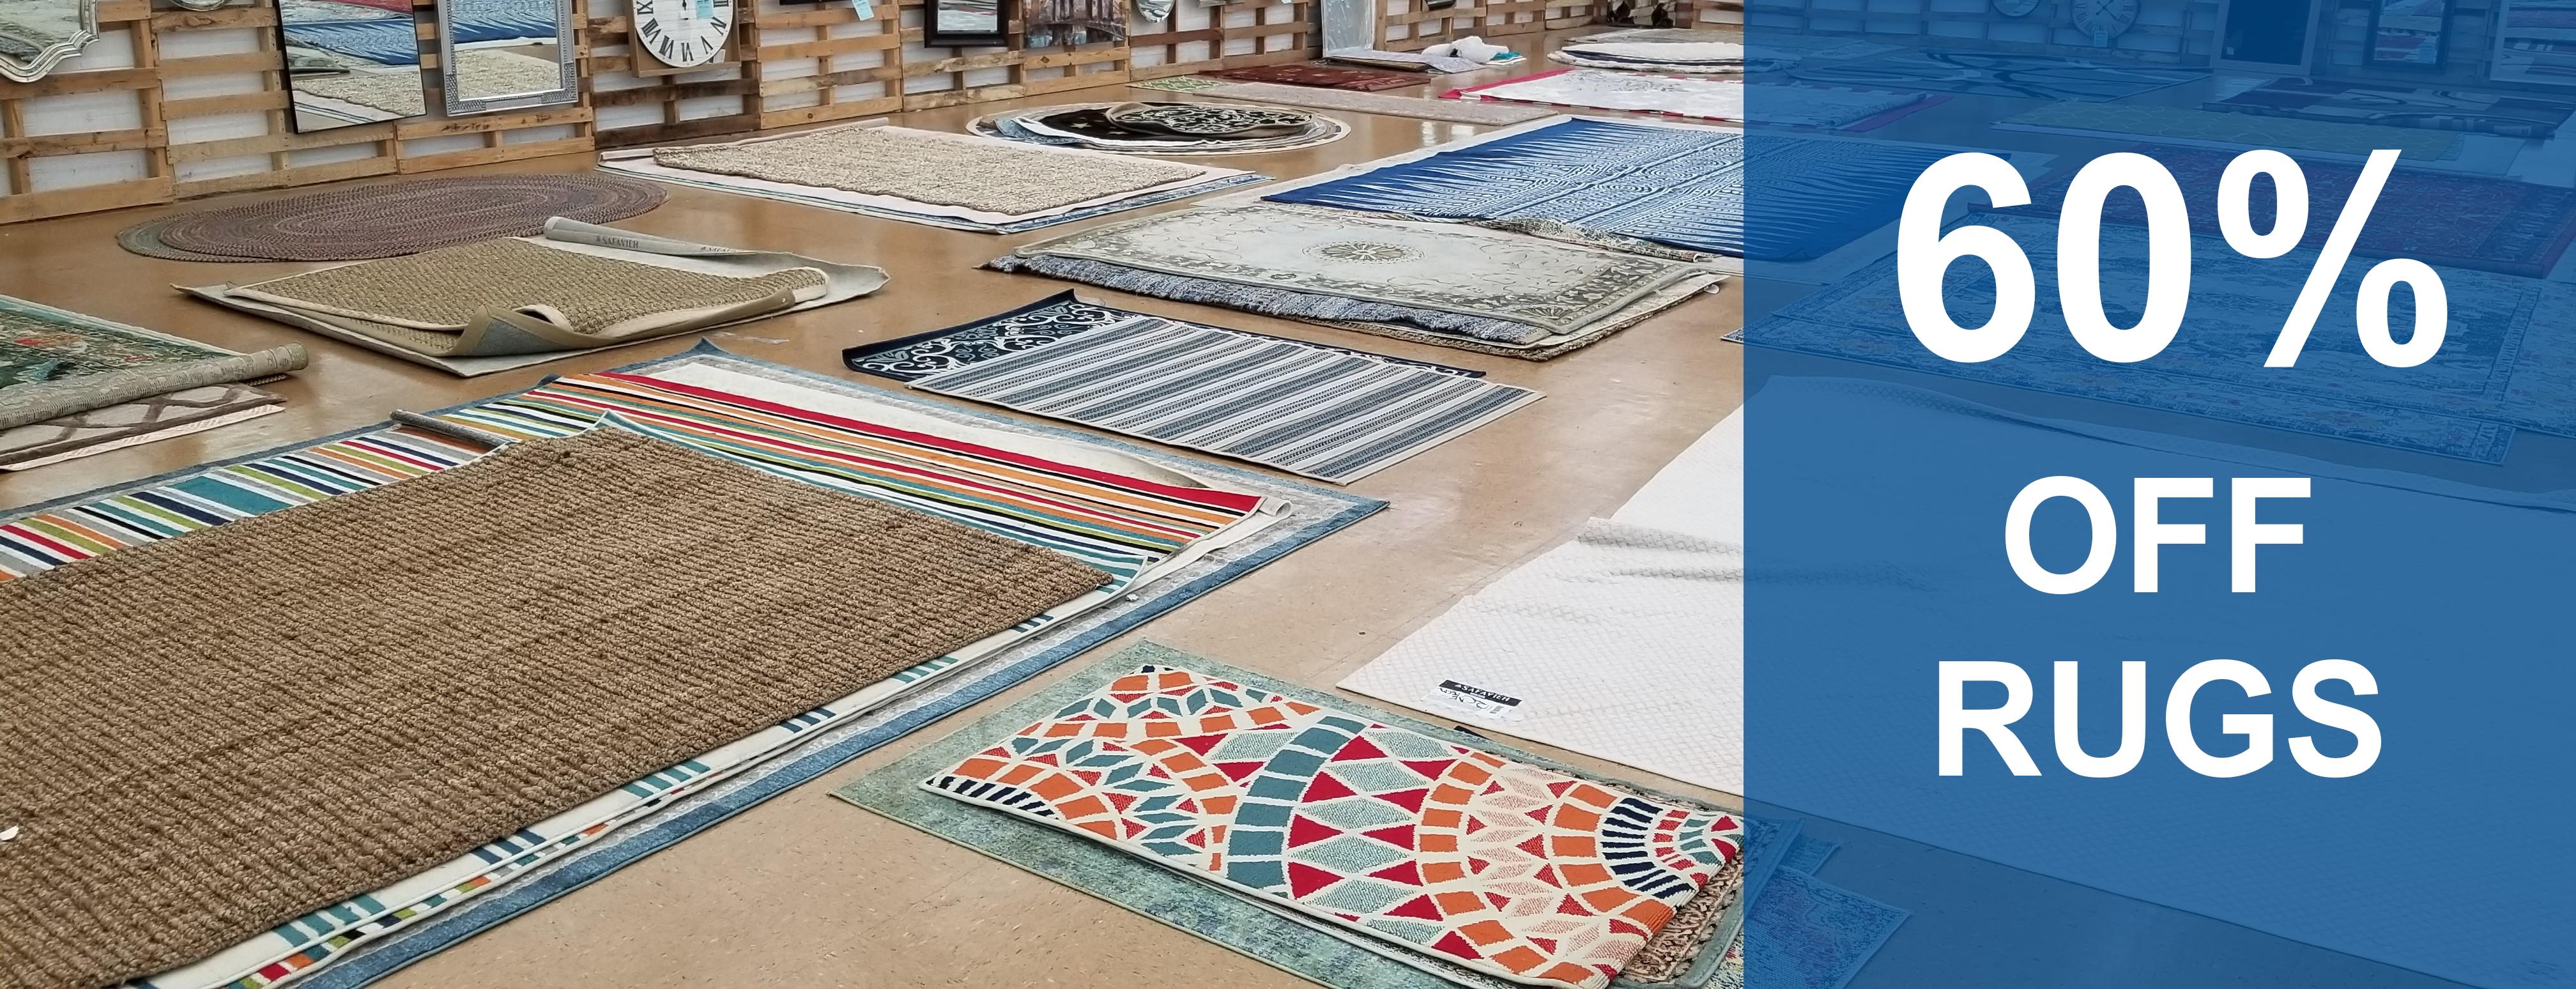 rugs-current-ad-v.2.jpg